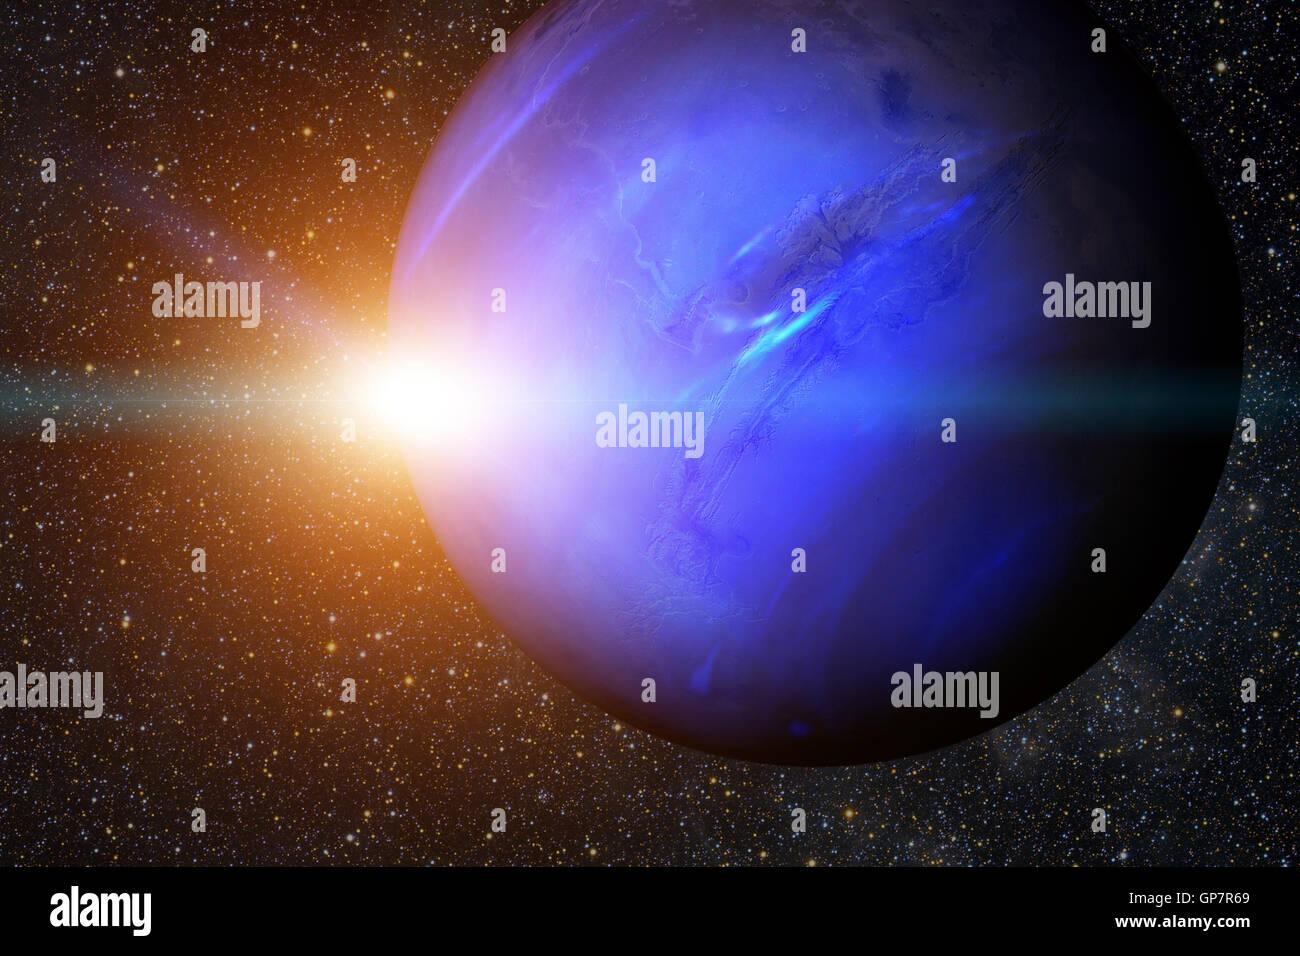 solar system neptune - photo #14